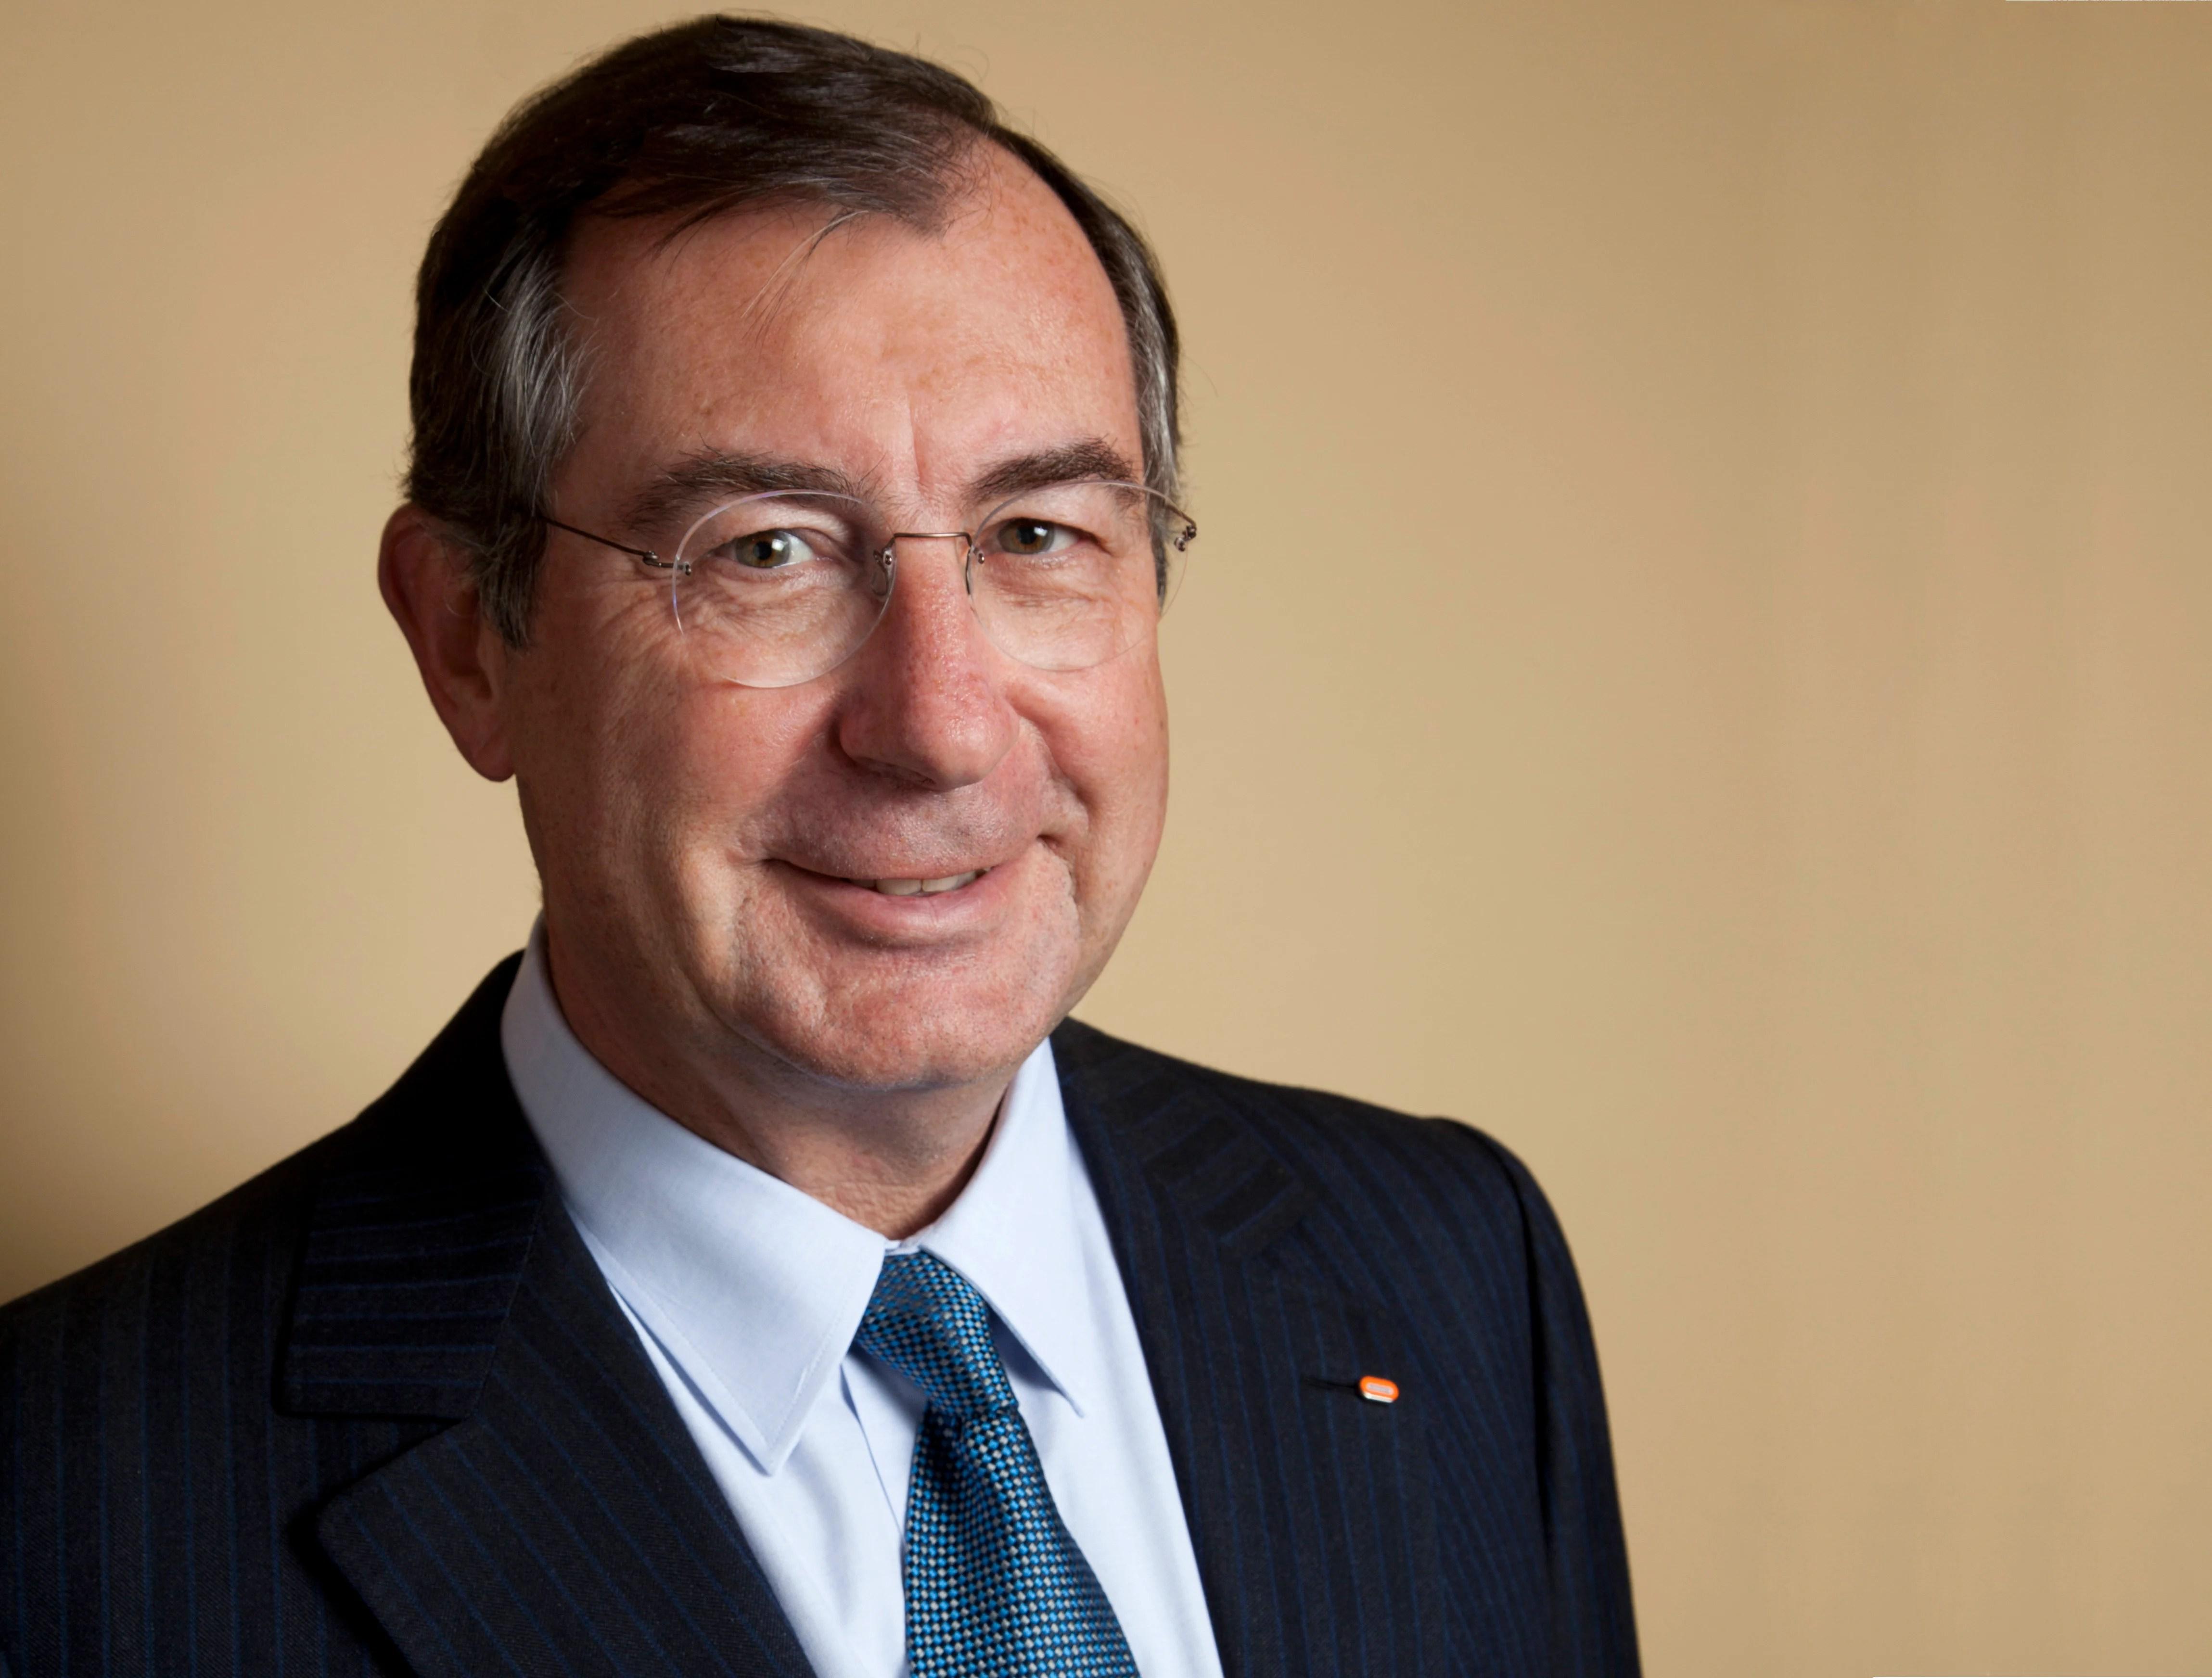 5G : Martin Bouygues envisage d'attaquer l'État si Huawei est exclu